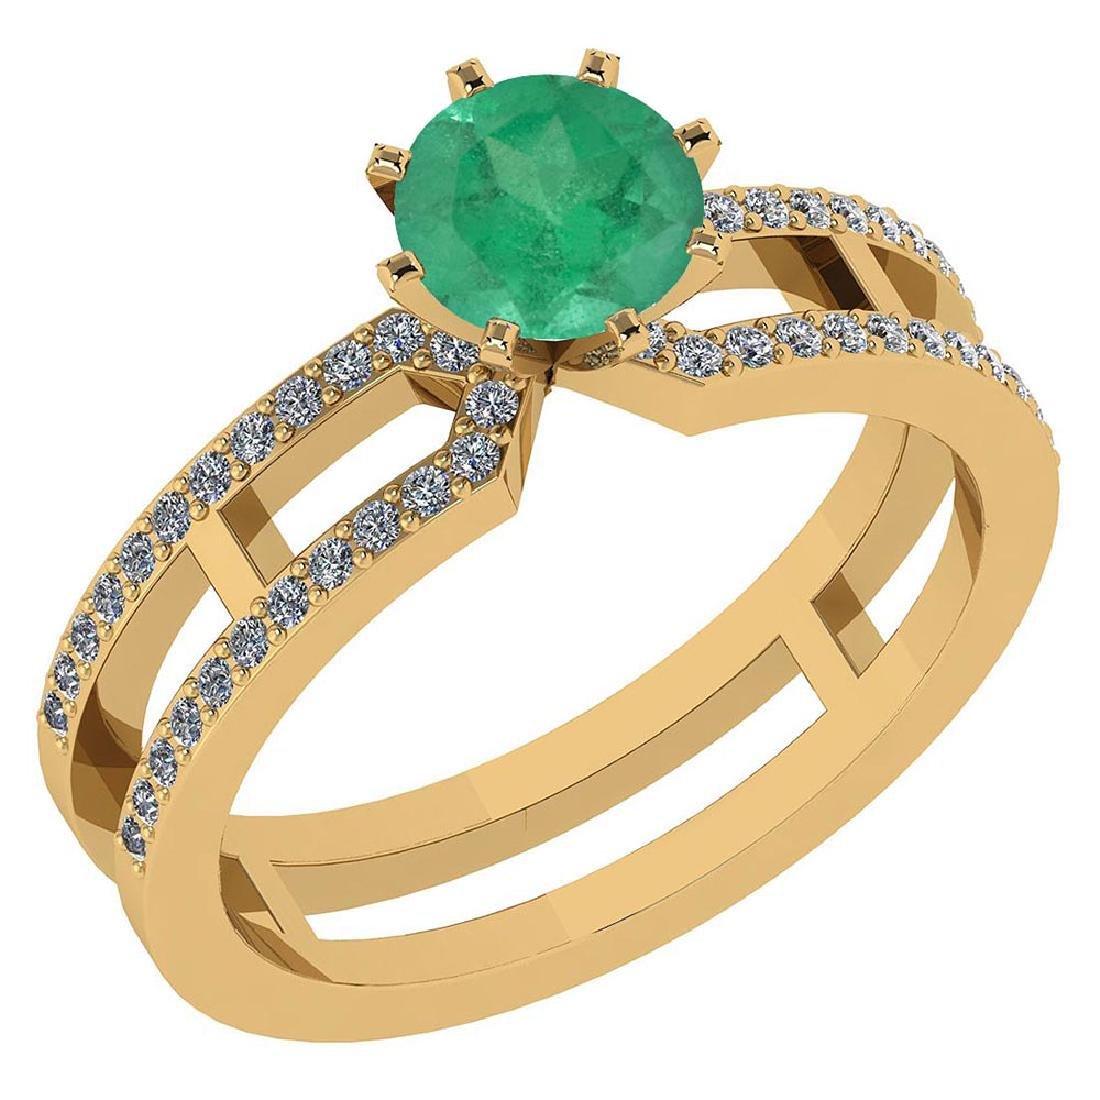 Certified 1.32 Ctw Genuine Emerald And Diamond 14k Yell